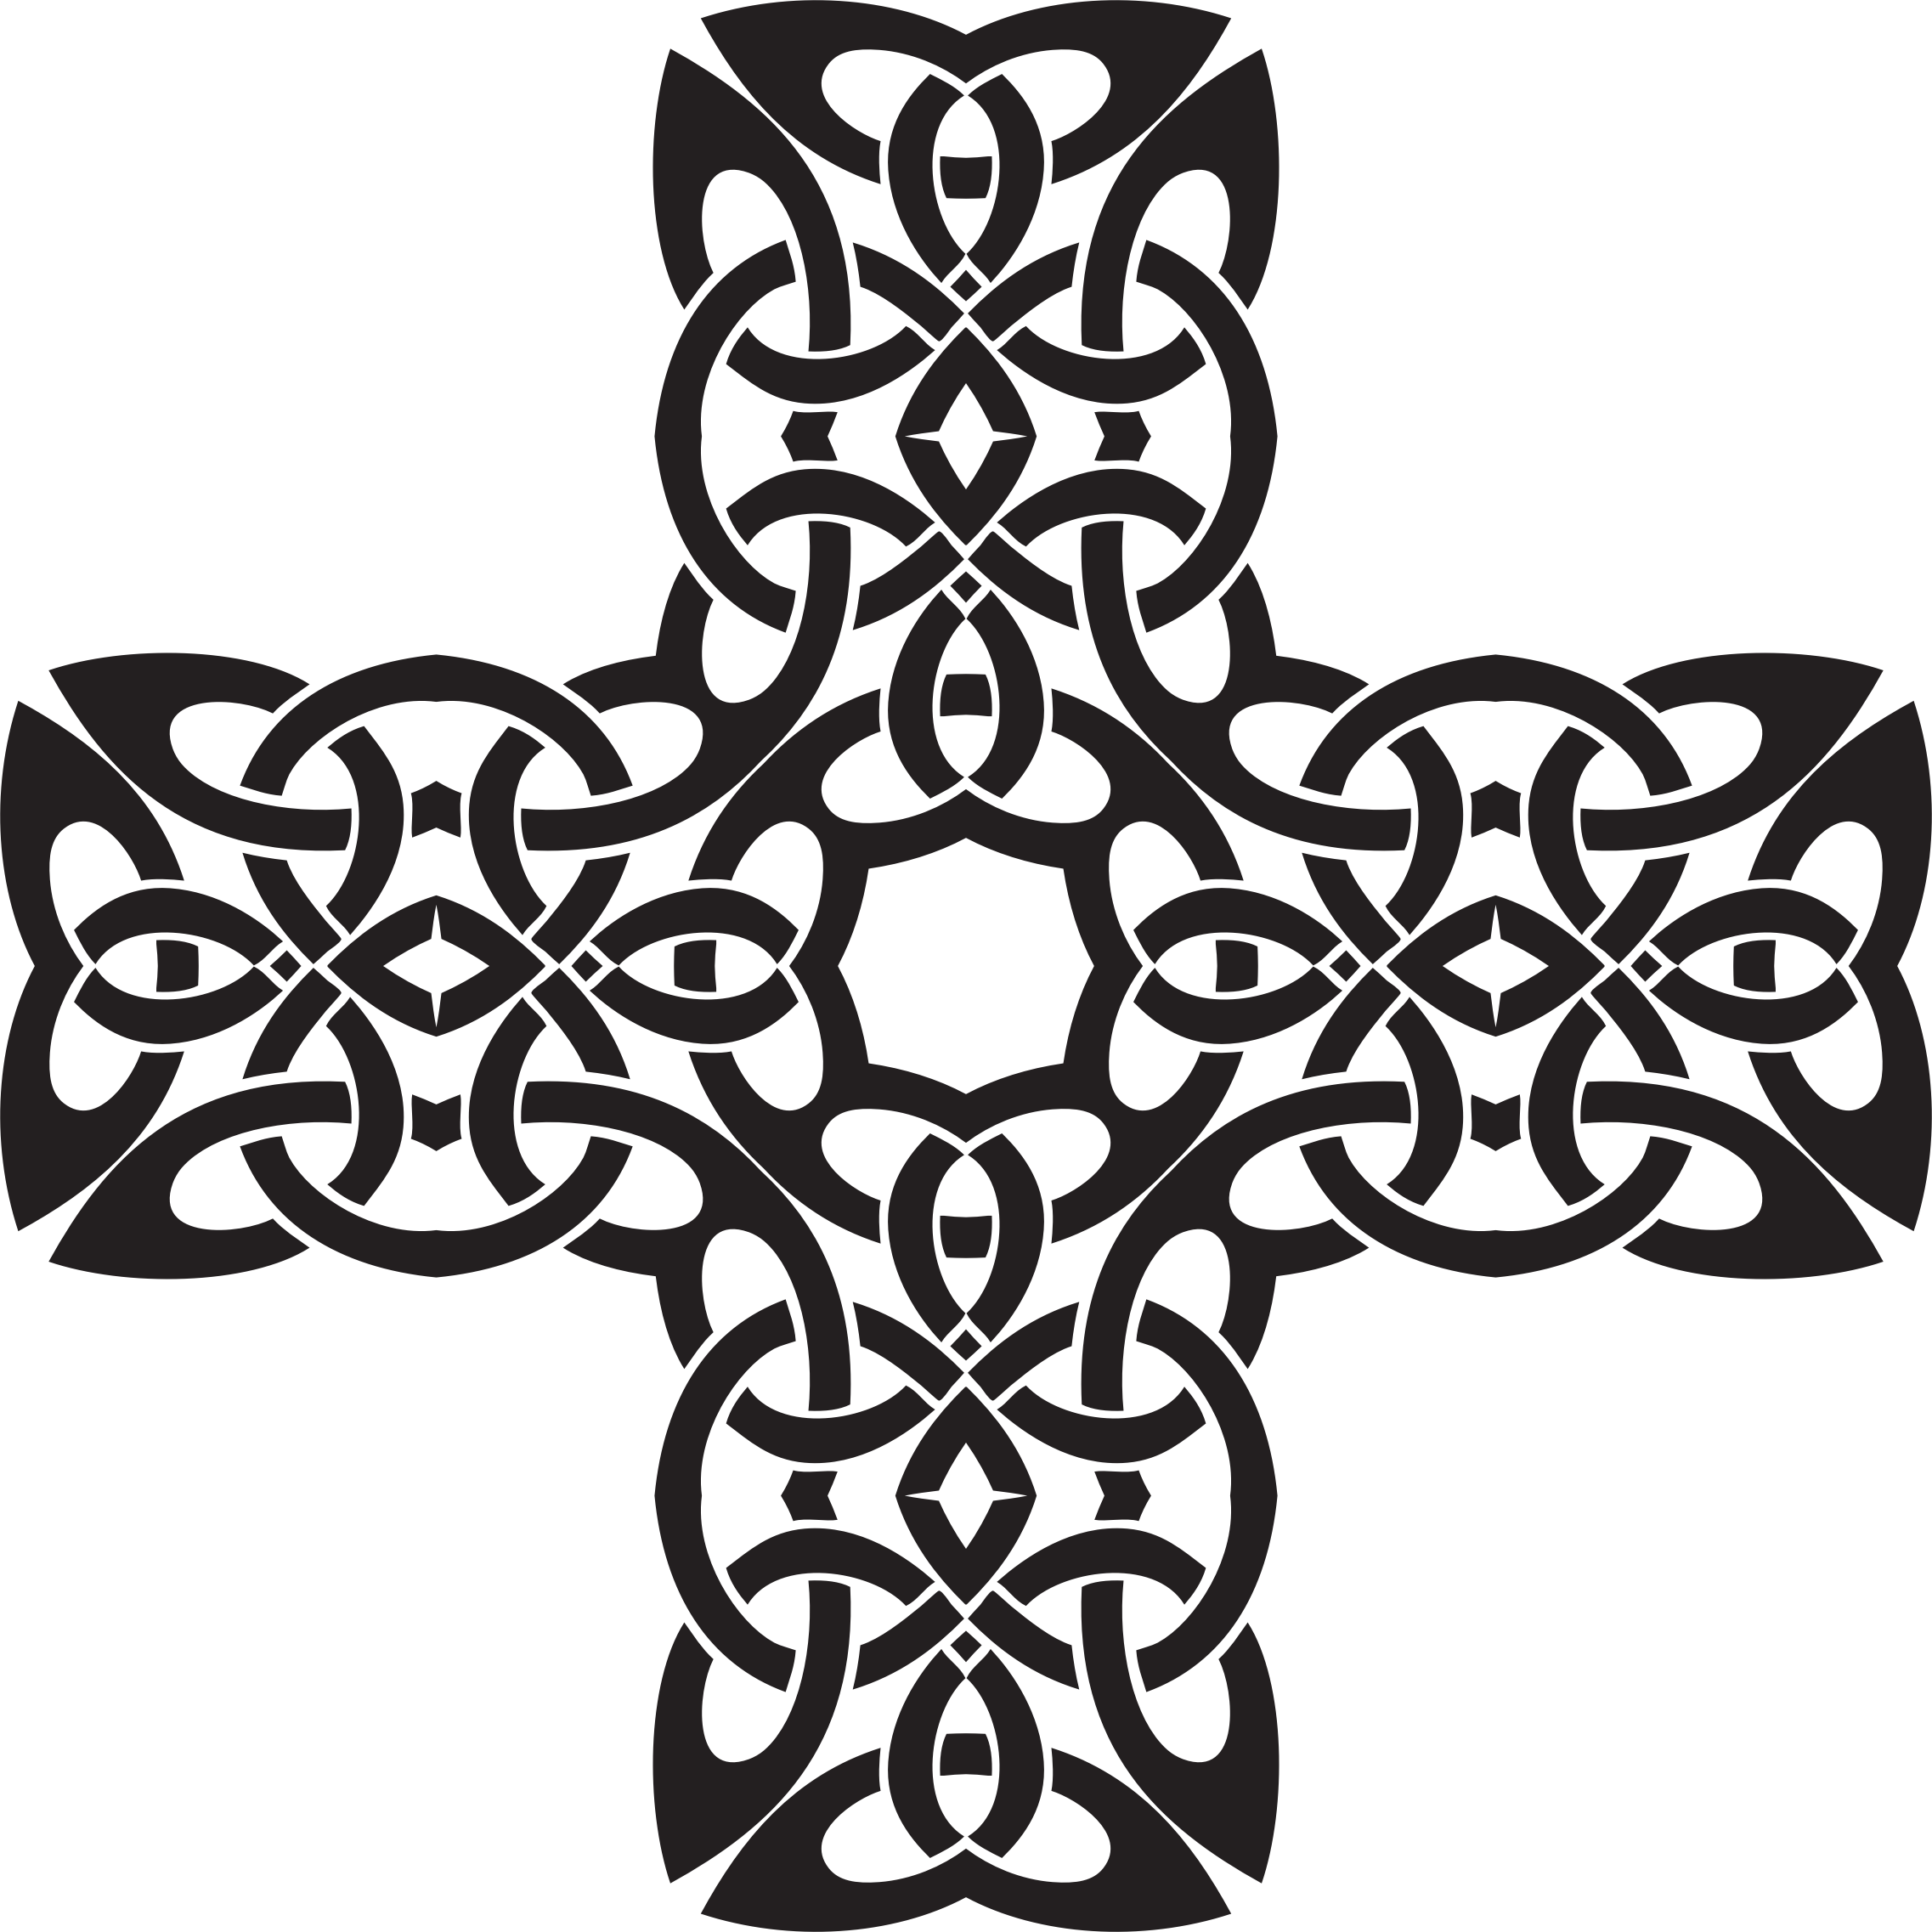 Celtic Knot Cross - Celtic Knot PNG